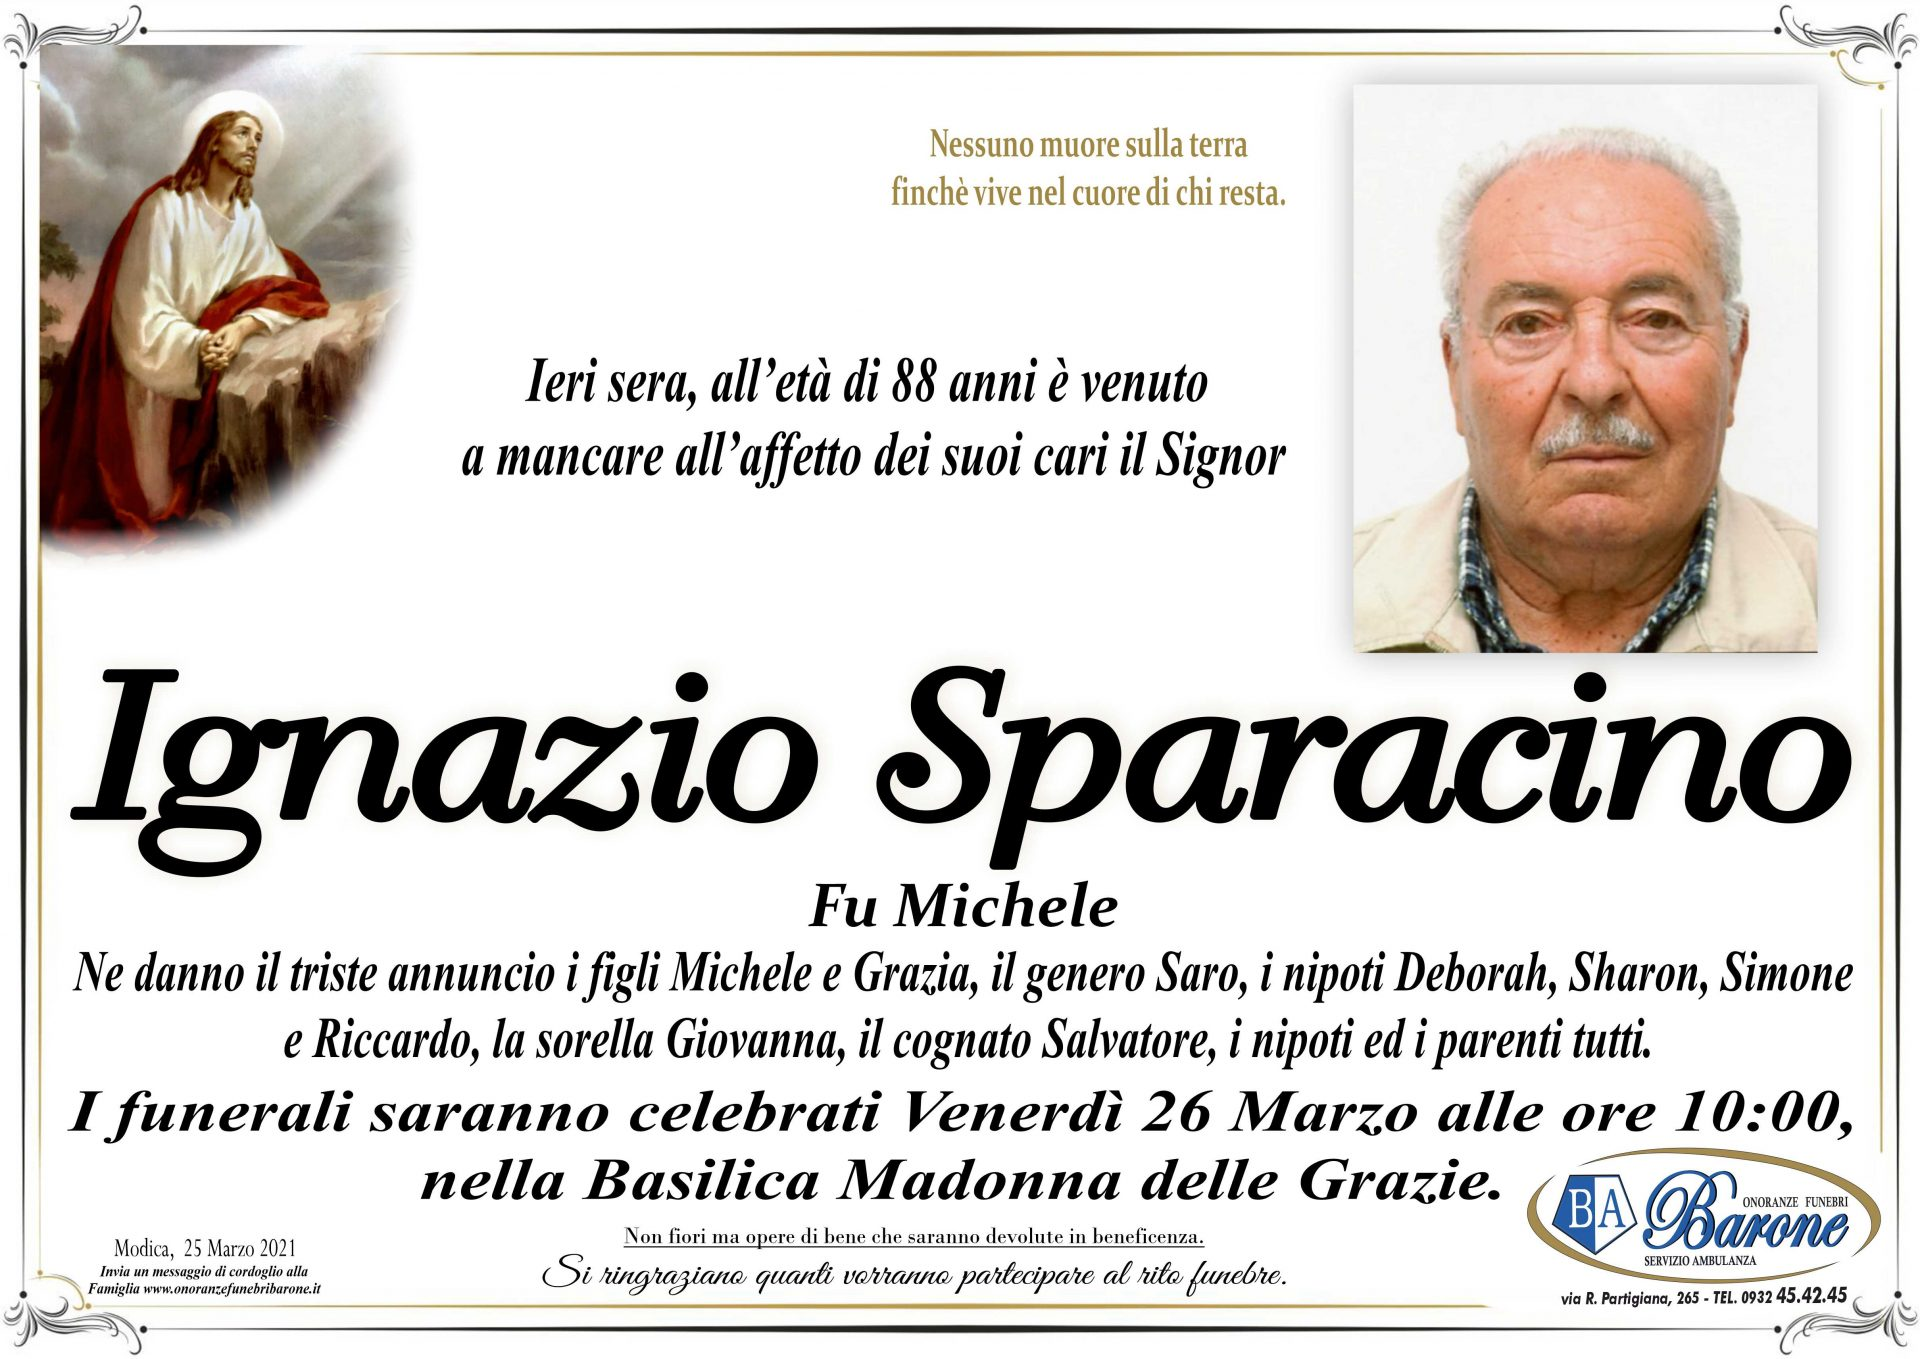 Ignazio Sparacino